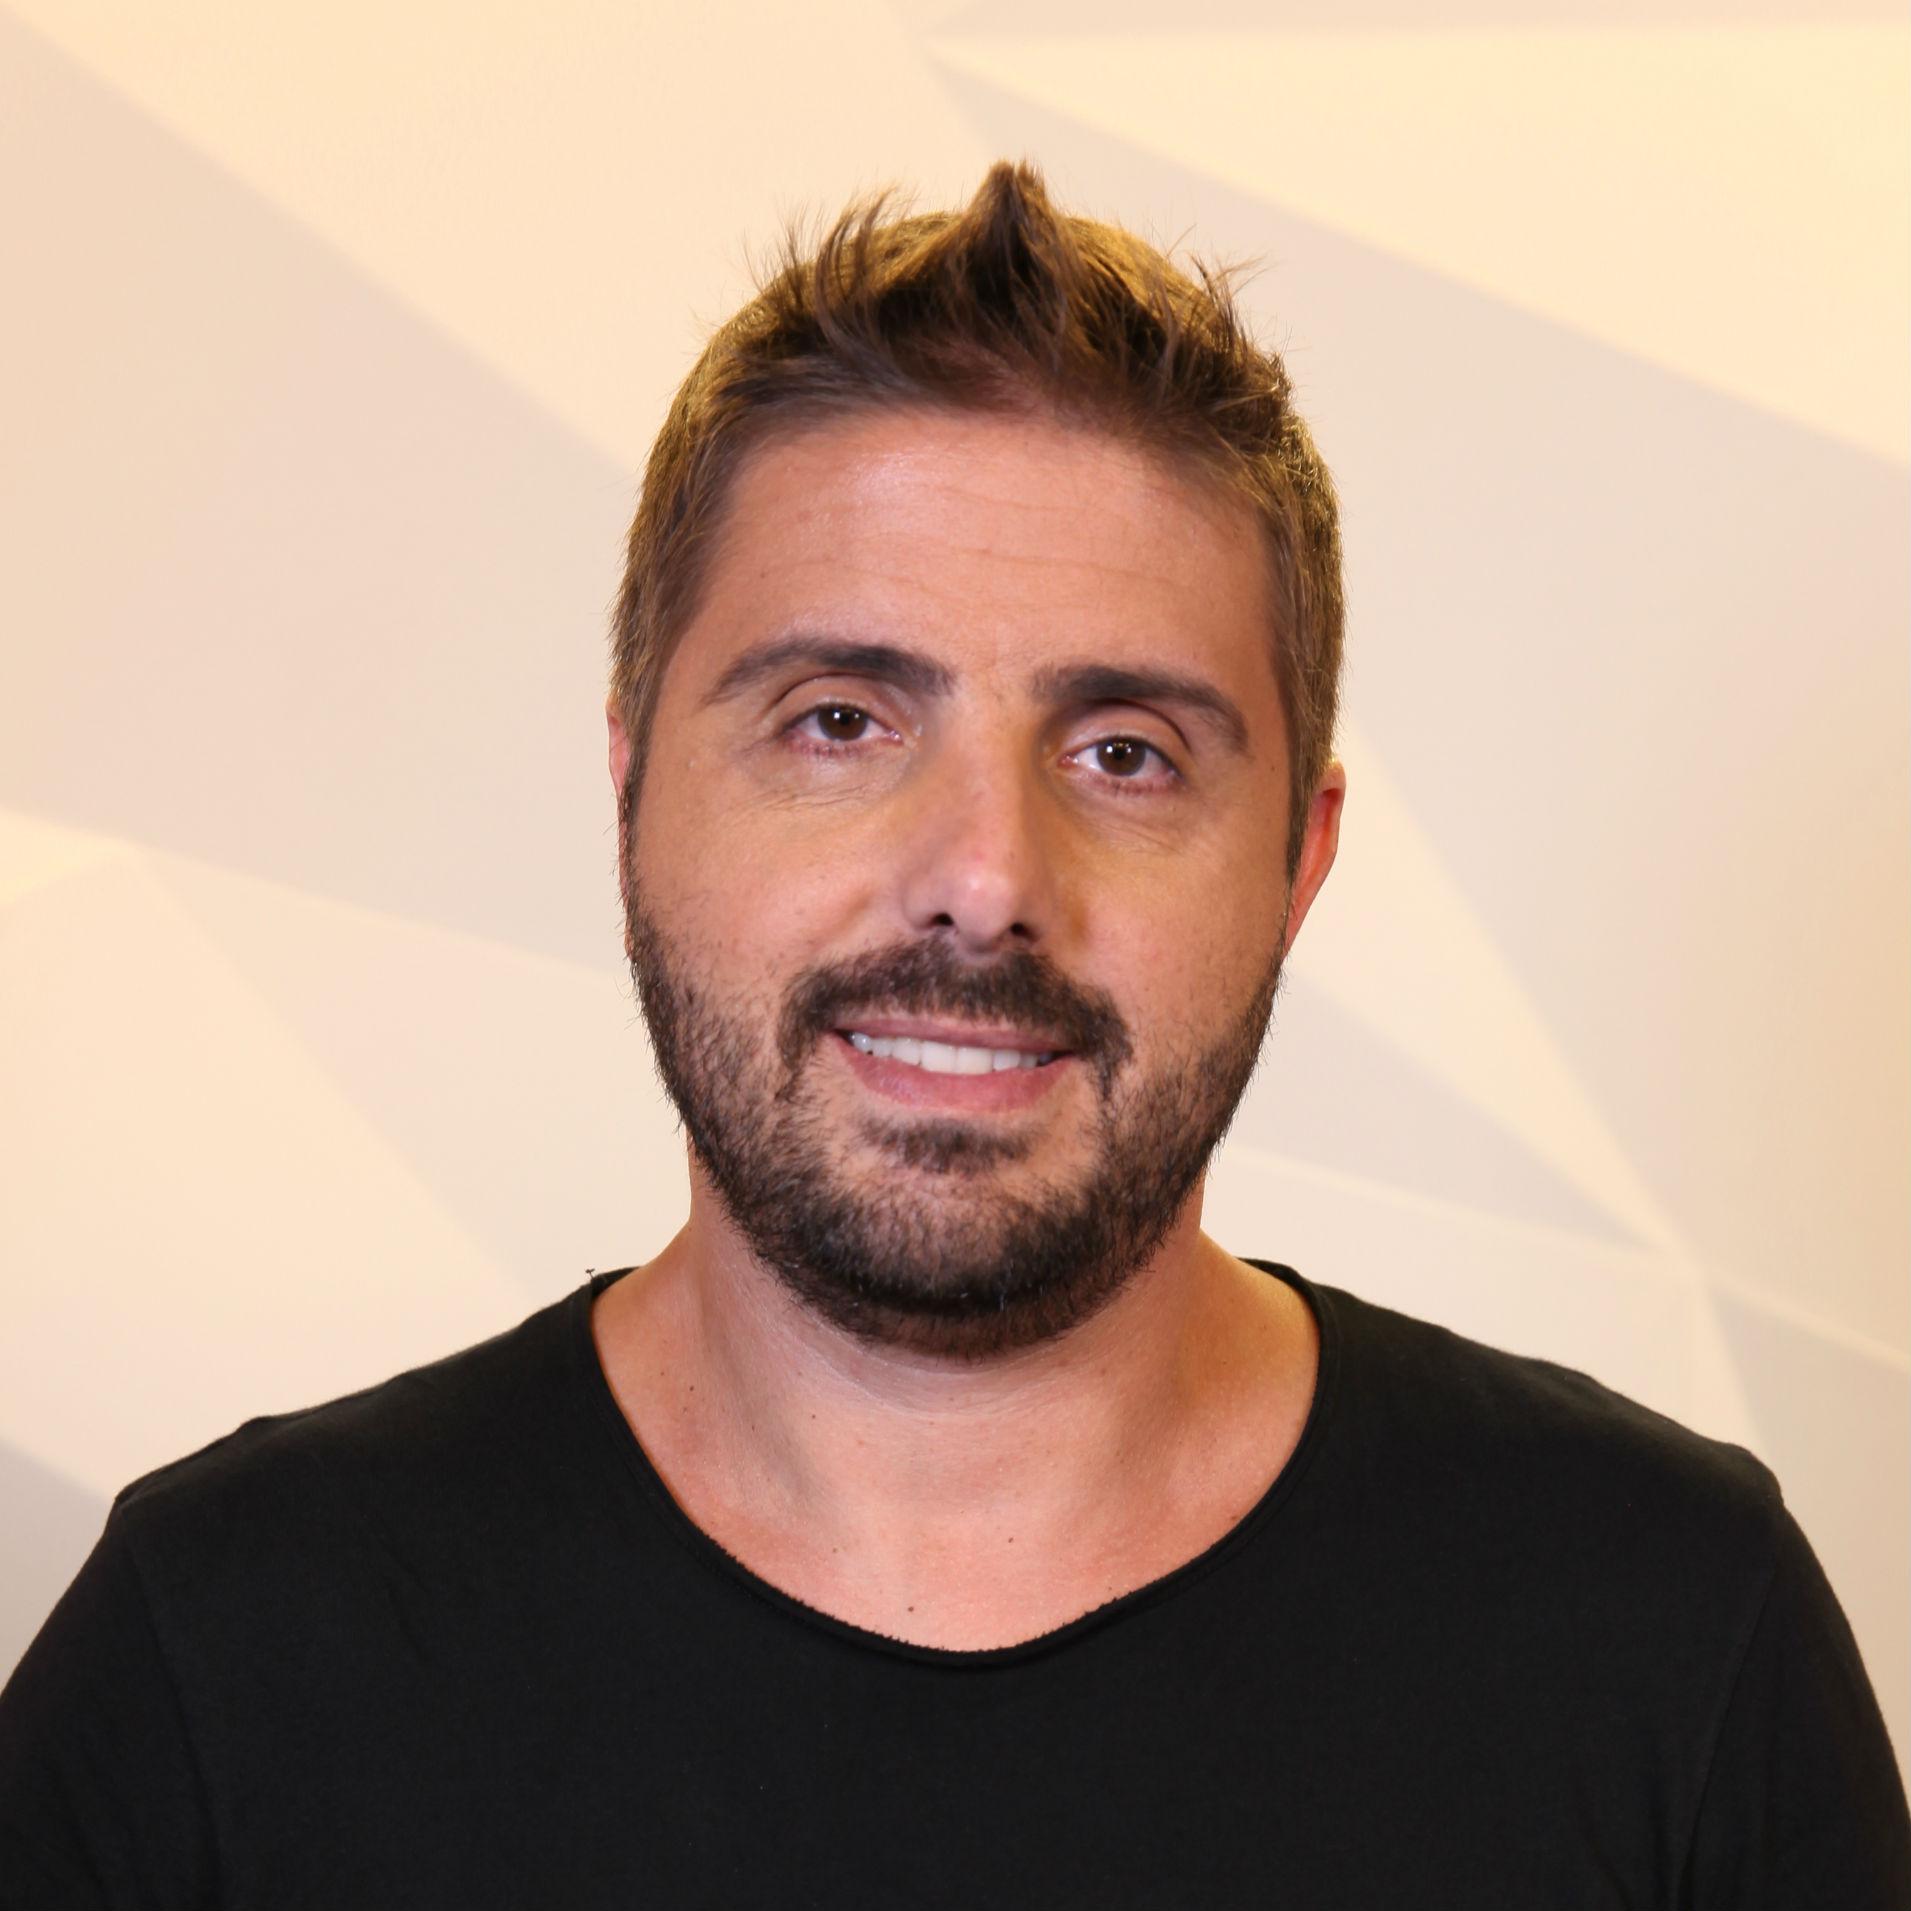 Jorge Nicola